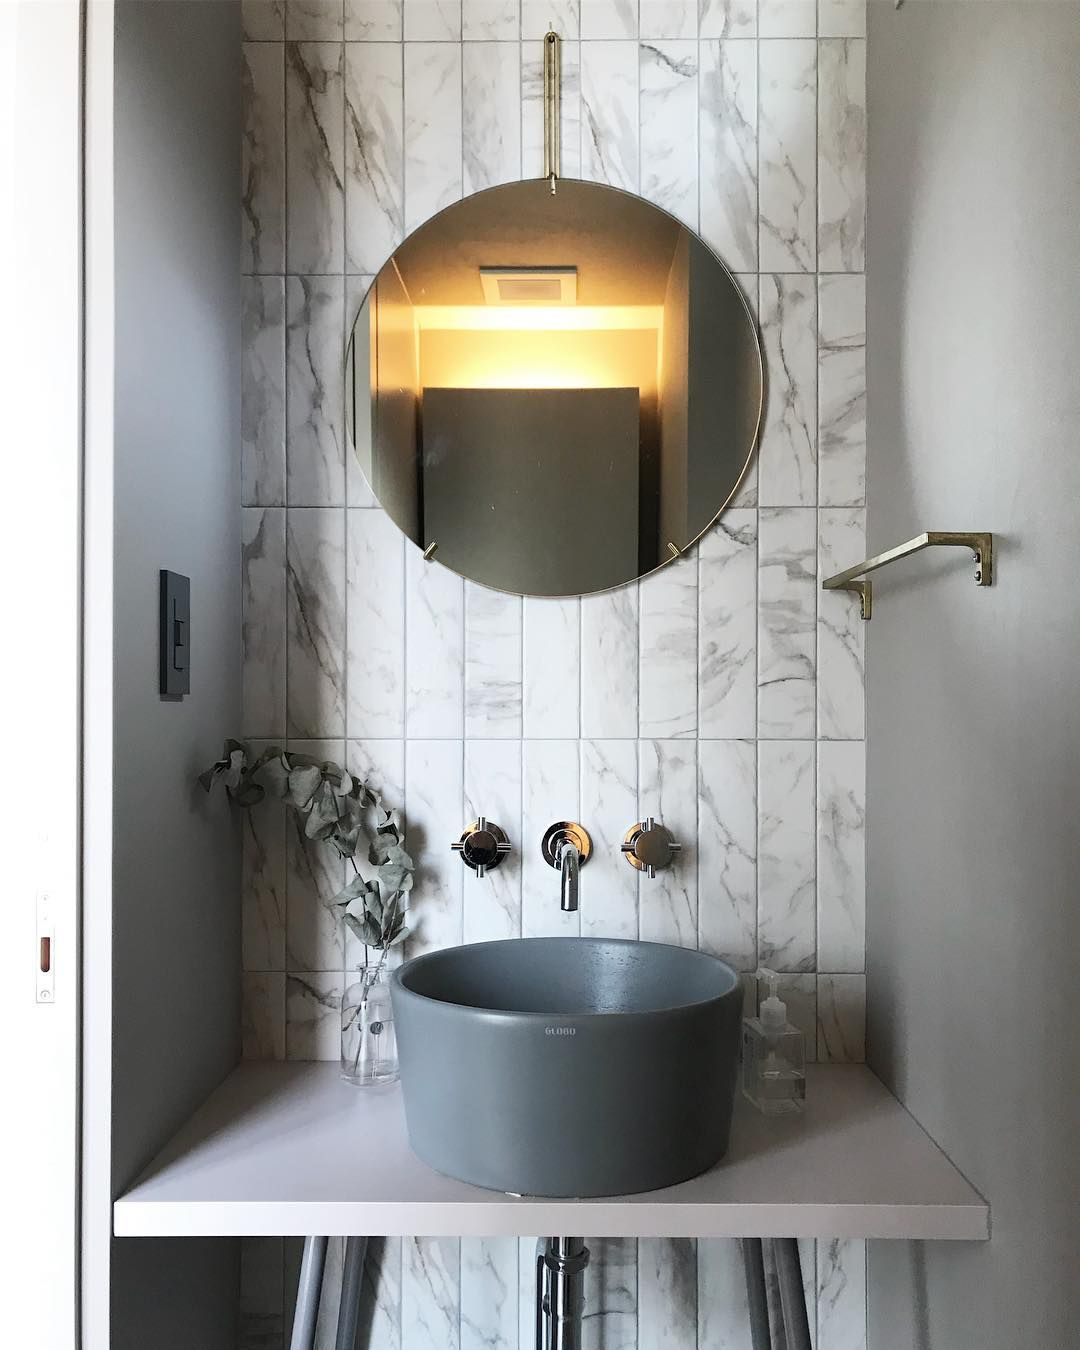 Sena Home On Instagram 2階リビングの我が家はトイレの洗面も少し